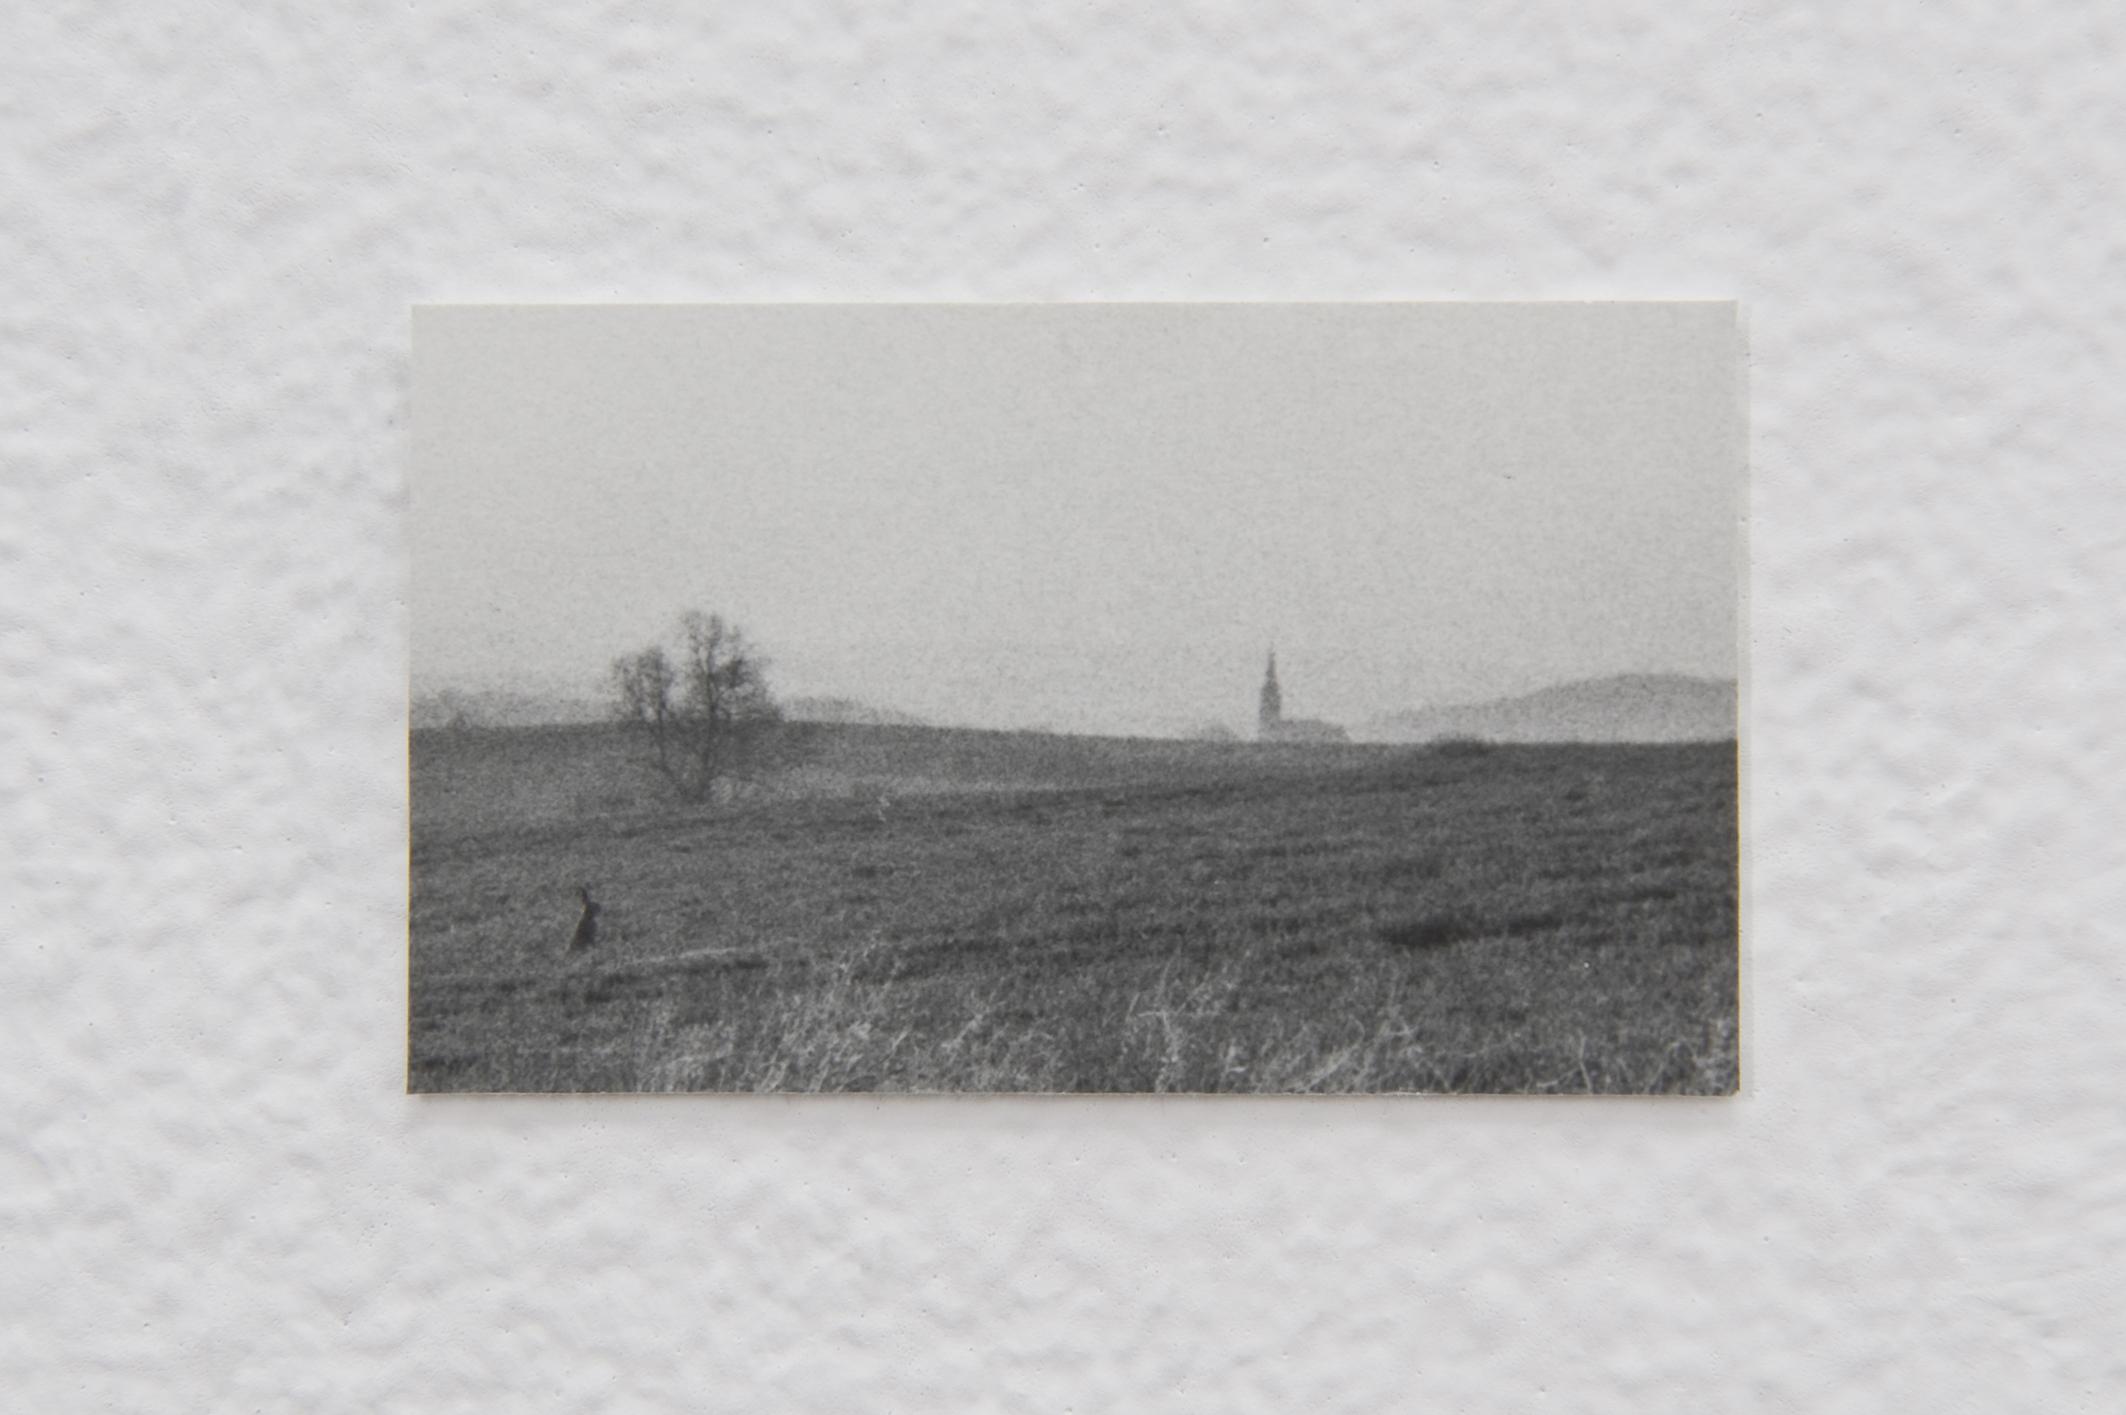 Untitled (Landscape), 2014 | Jochen Lempert | ProjecteSD